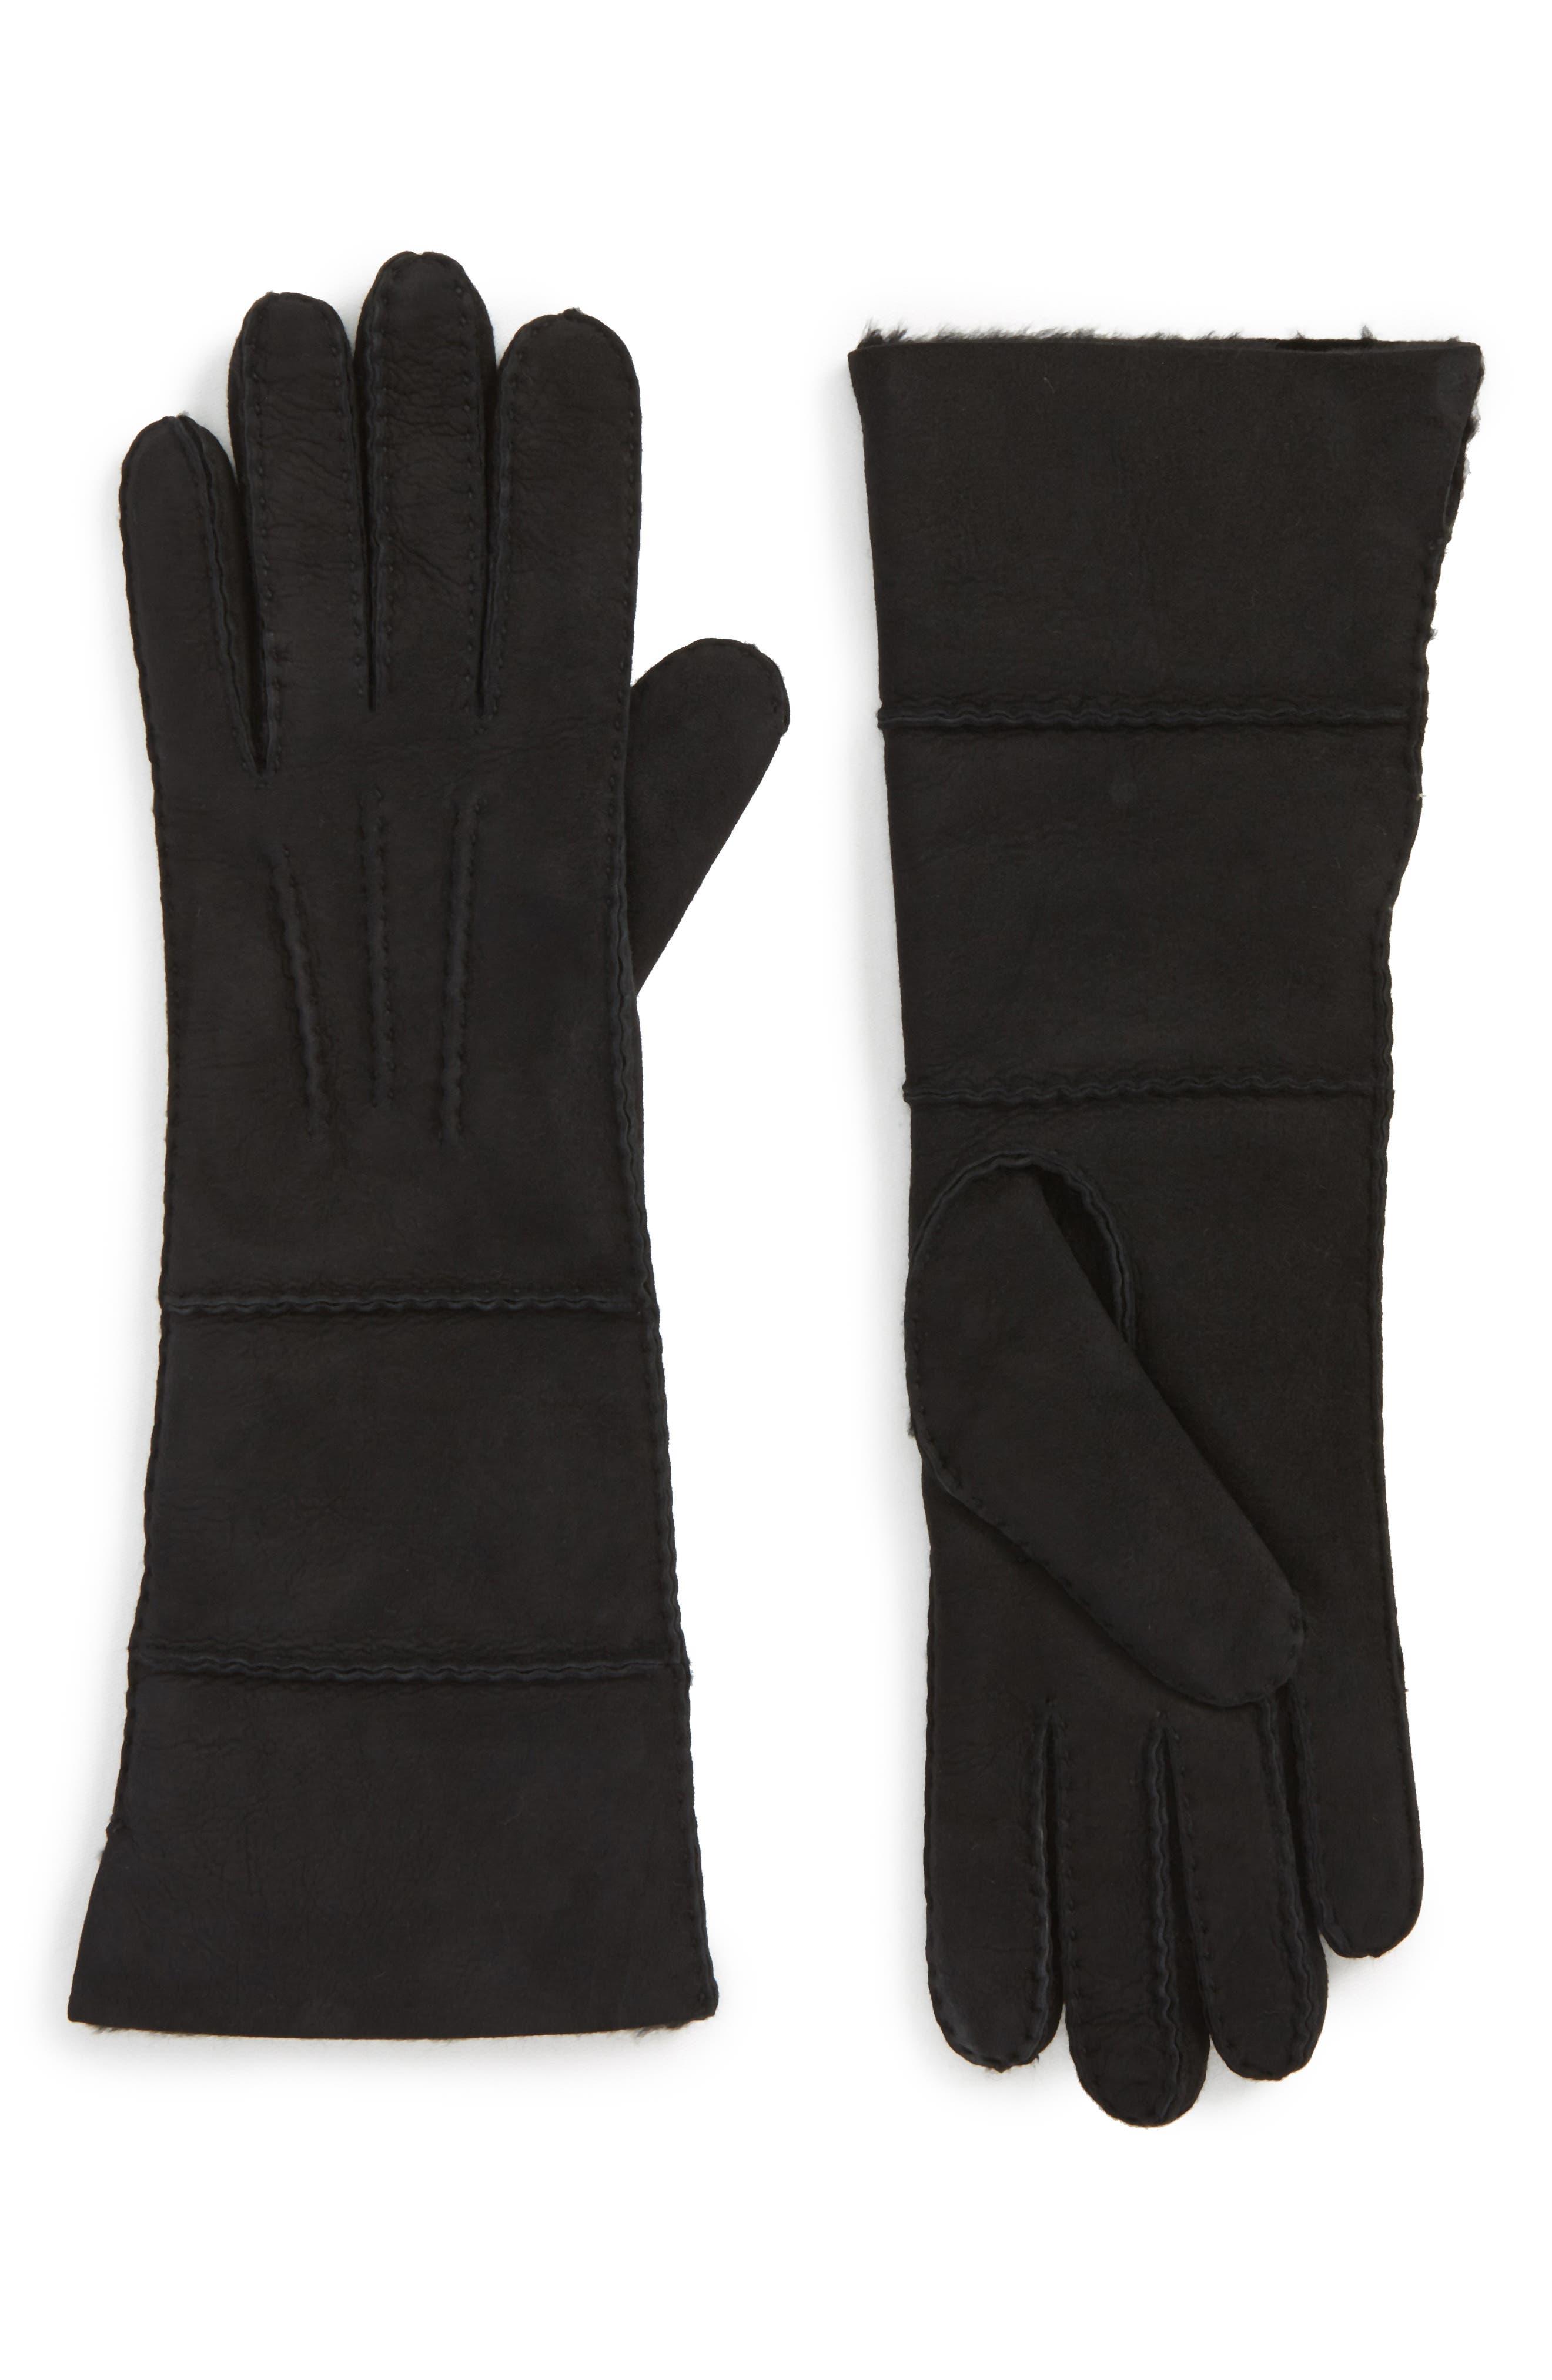 UGG<sup>®</sup> Long Slim Genuine Shearling Gloves,                         Main,                         color, Black